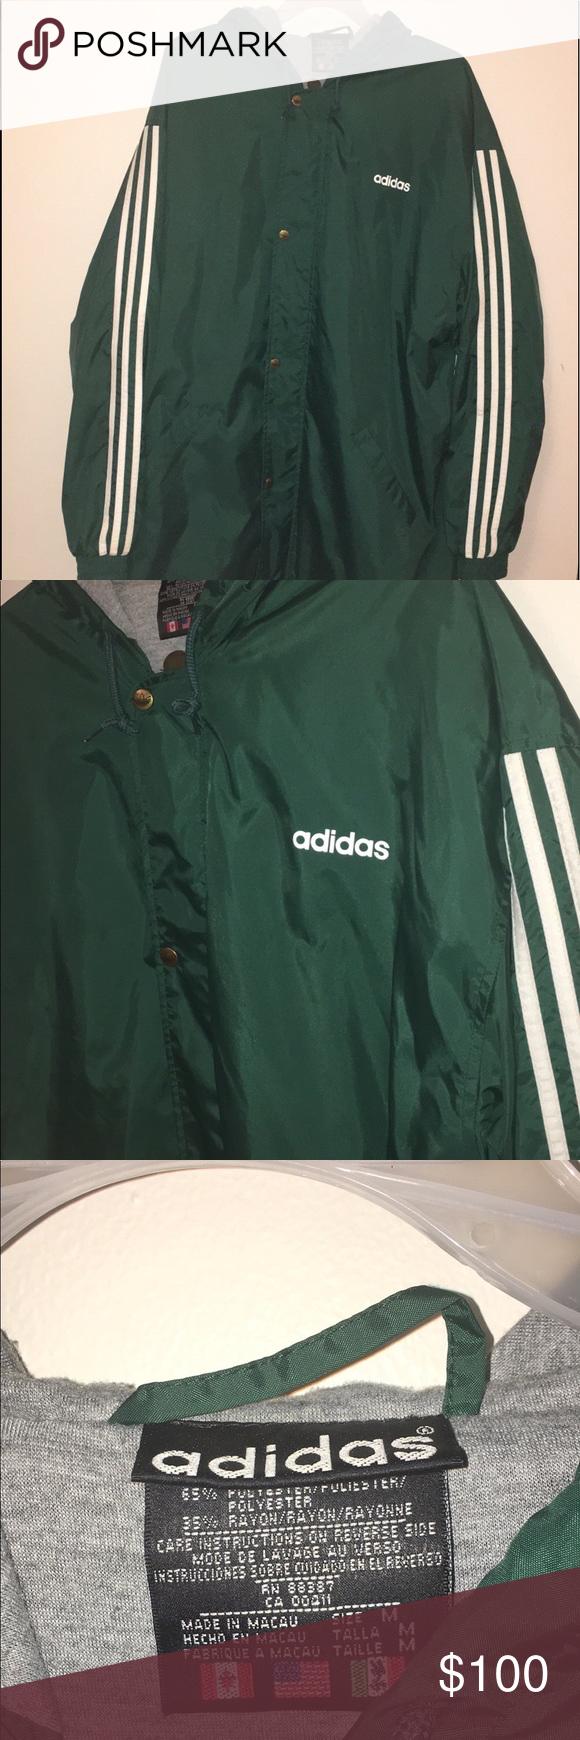 11 Best Adidas Jacket images | Jackets, Adidas jacket, Hoodies